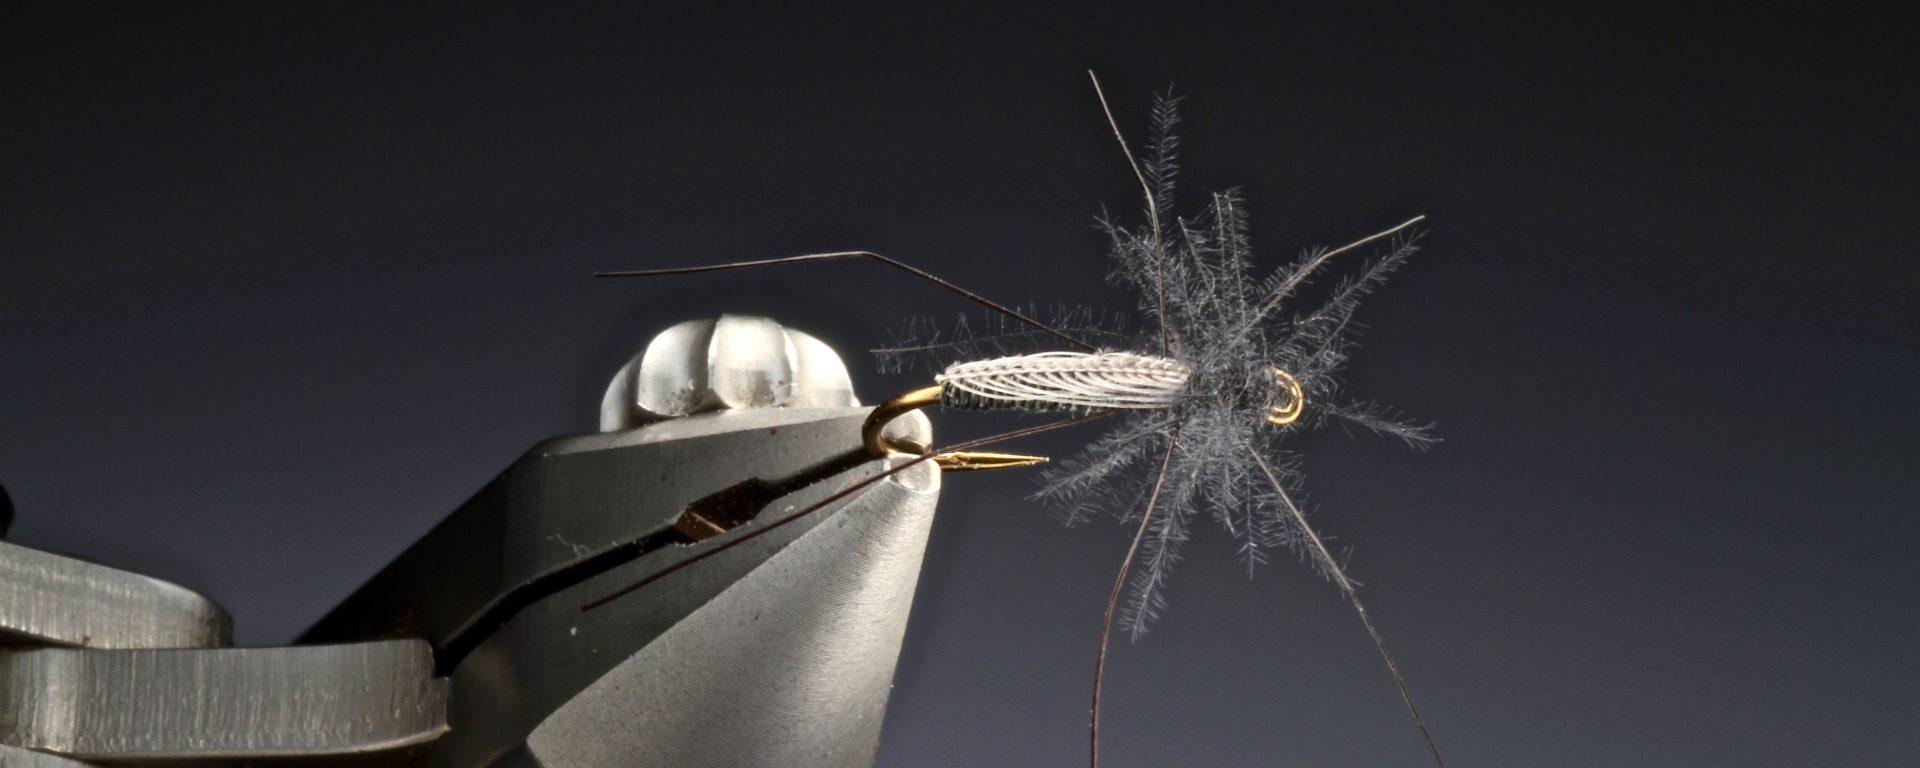 fly tying Long legged adult midge